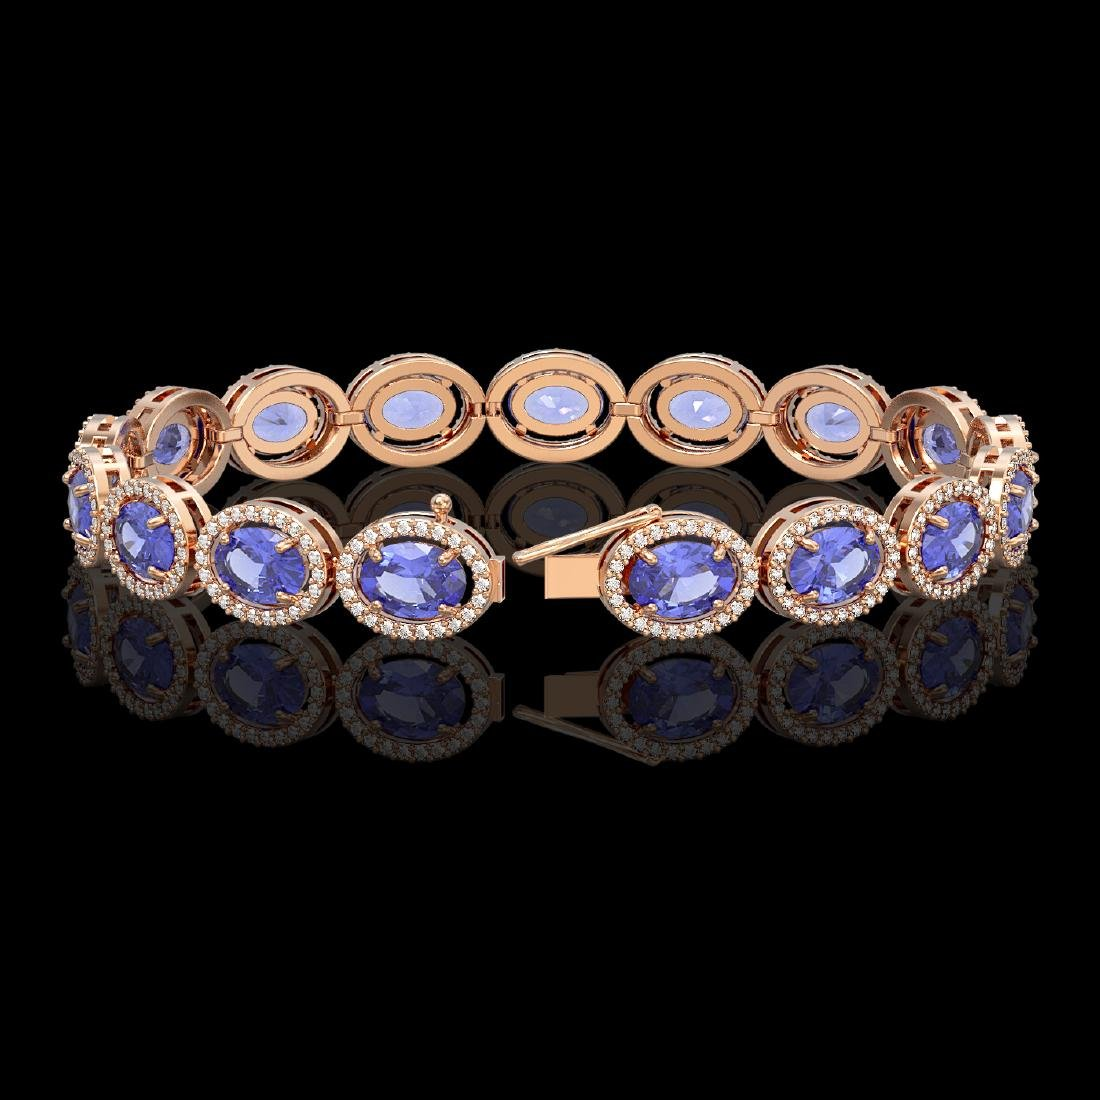 21.35 CTW Tanzanite & Diamond Halo Bracelet 10K Rose - 2